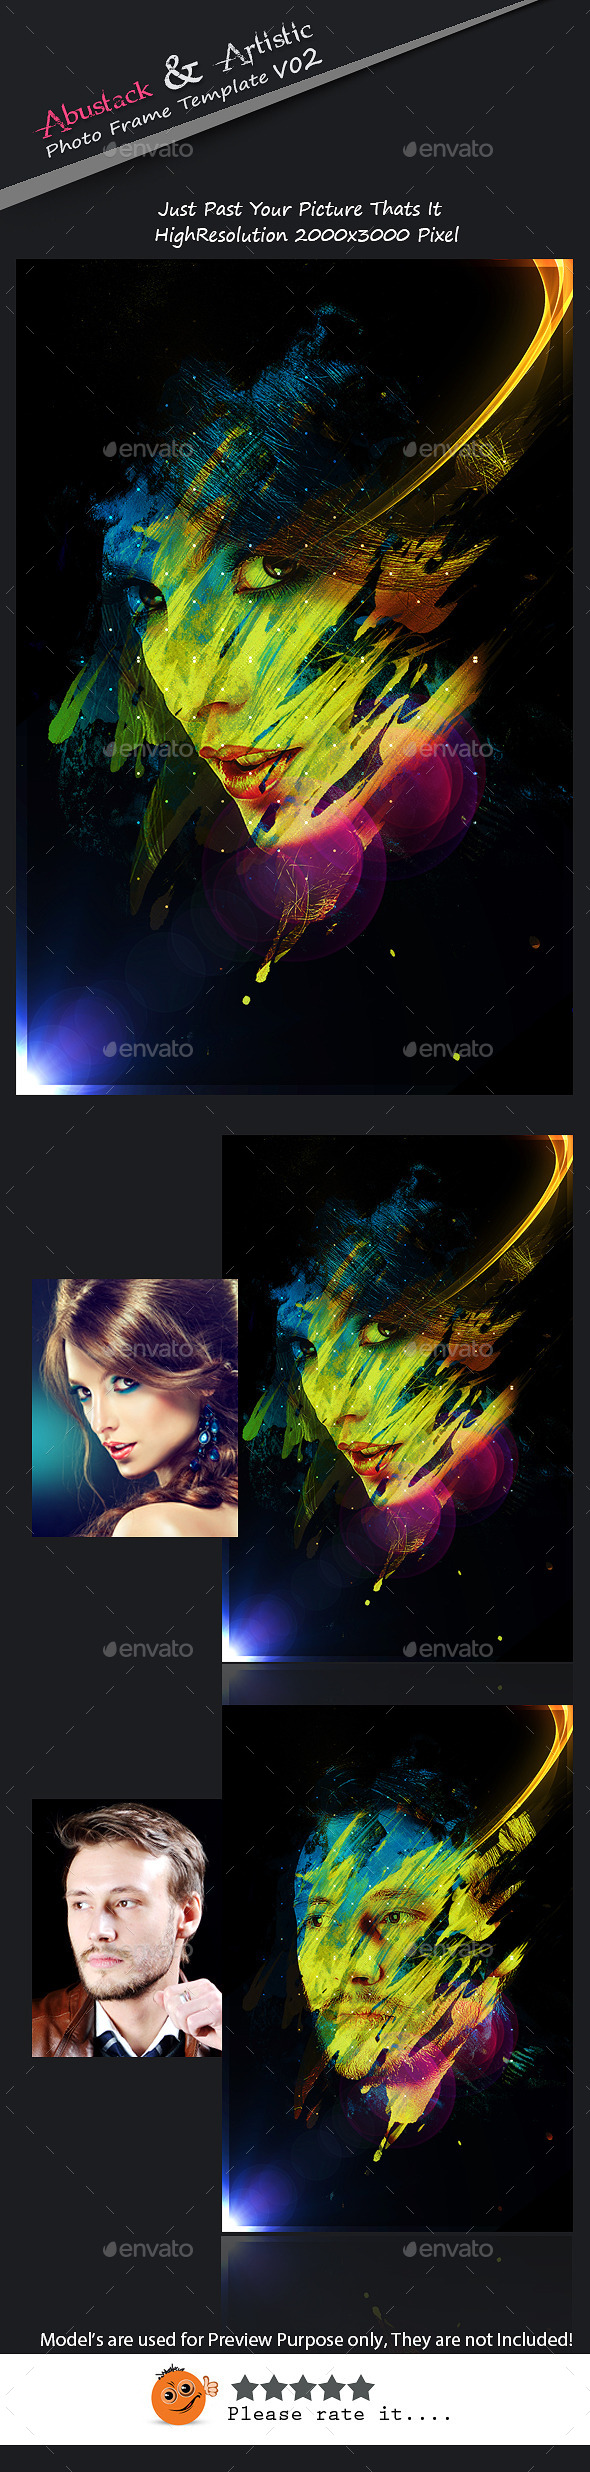 Abstrakt & Artistic Photo Frame Template v02 - Artistic Photo Templates